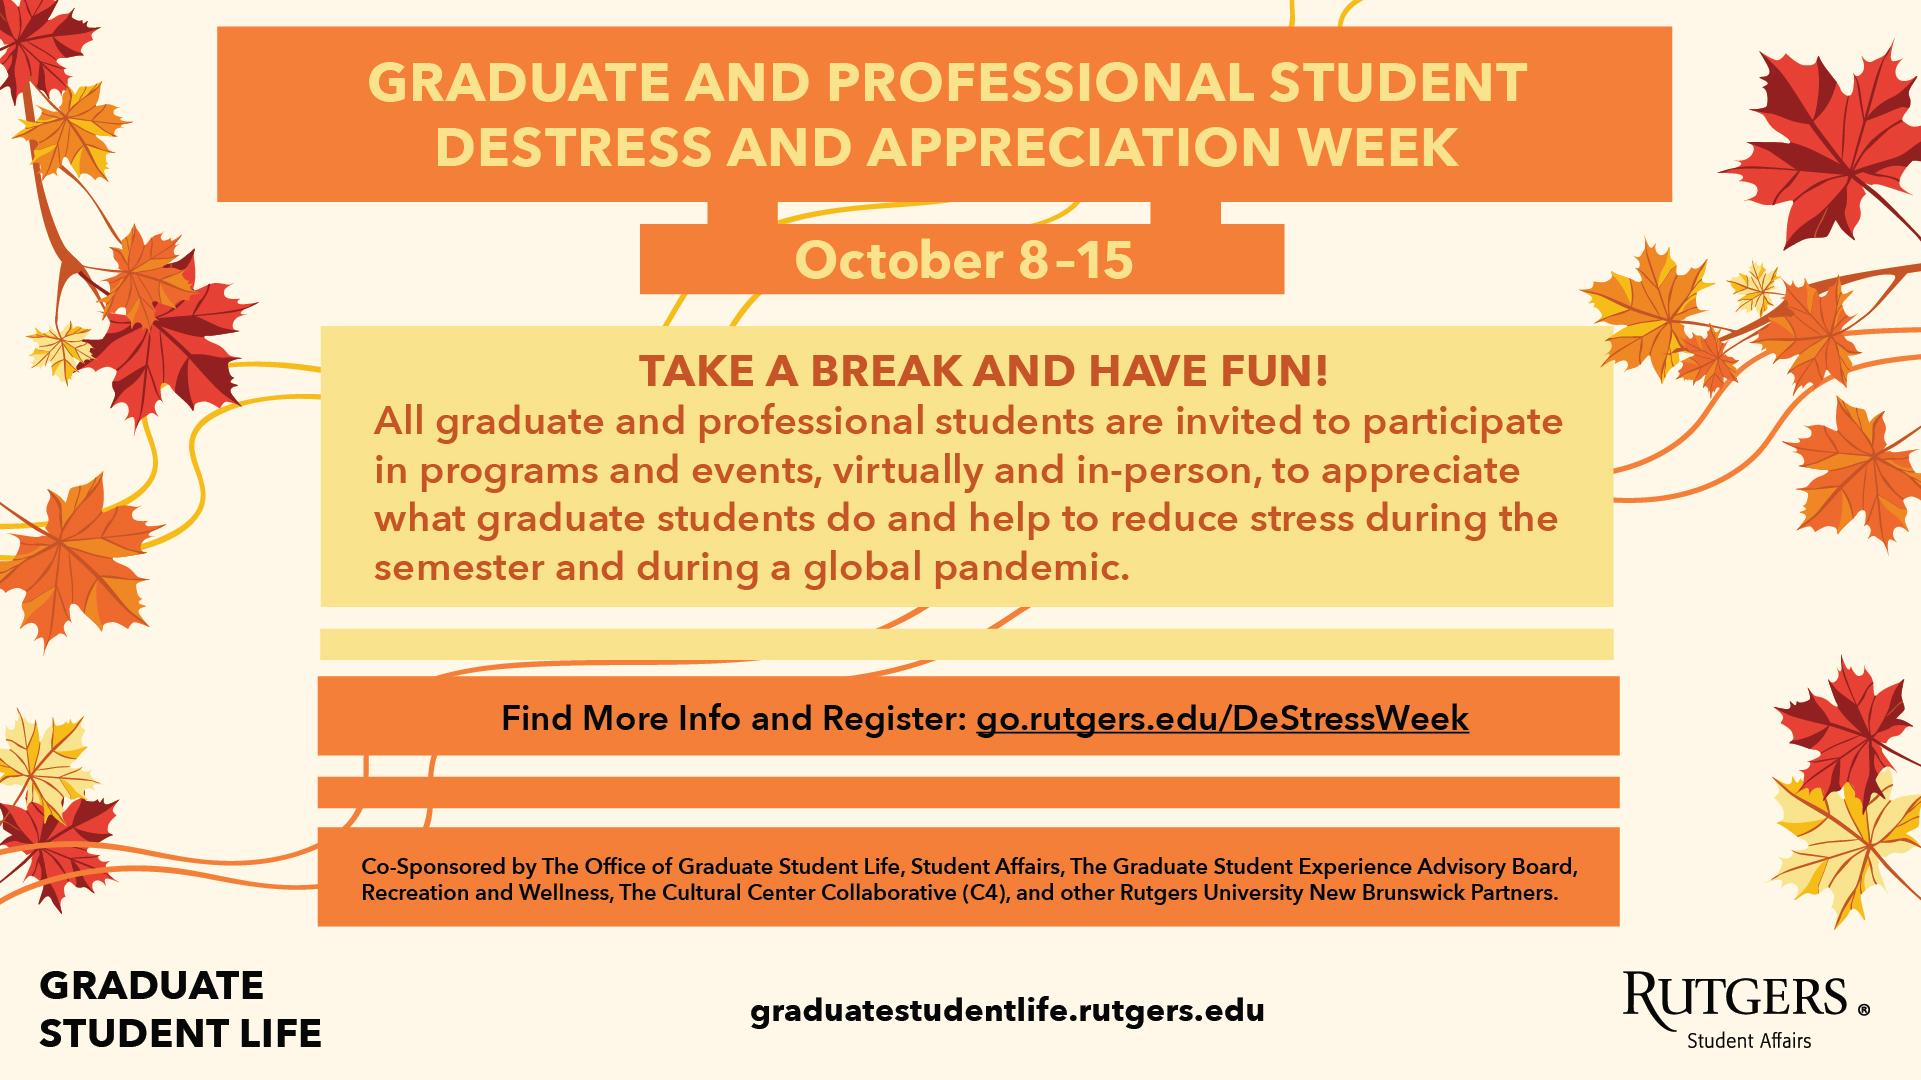 GSL_Graduate-and-Professional-Student-DeStress-and-Appreciation-Week_Digital-Screen_F21